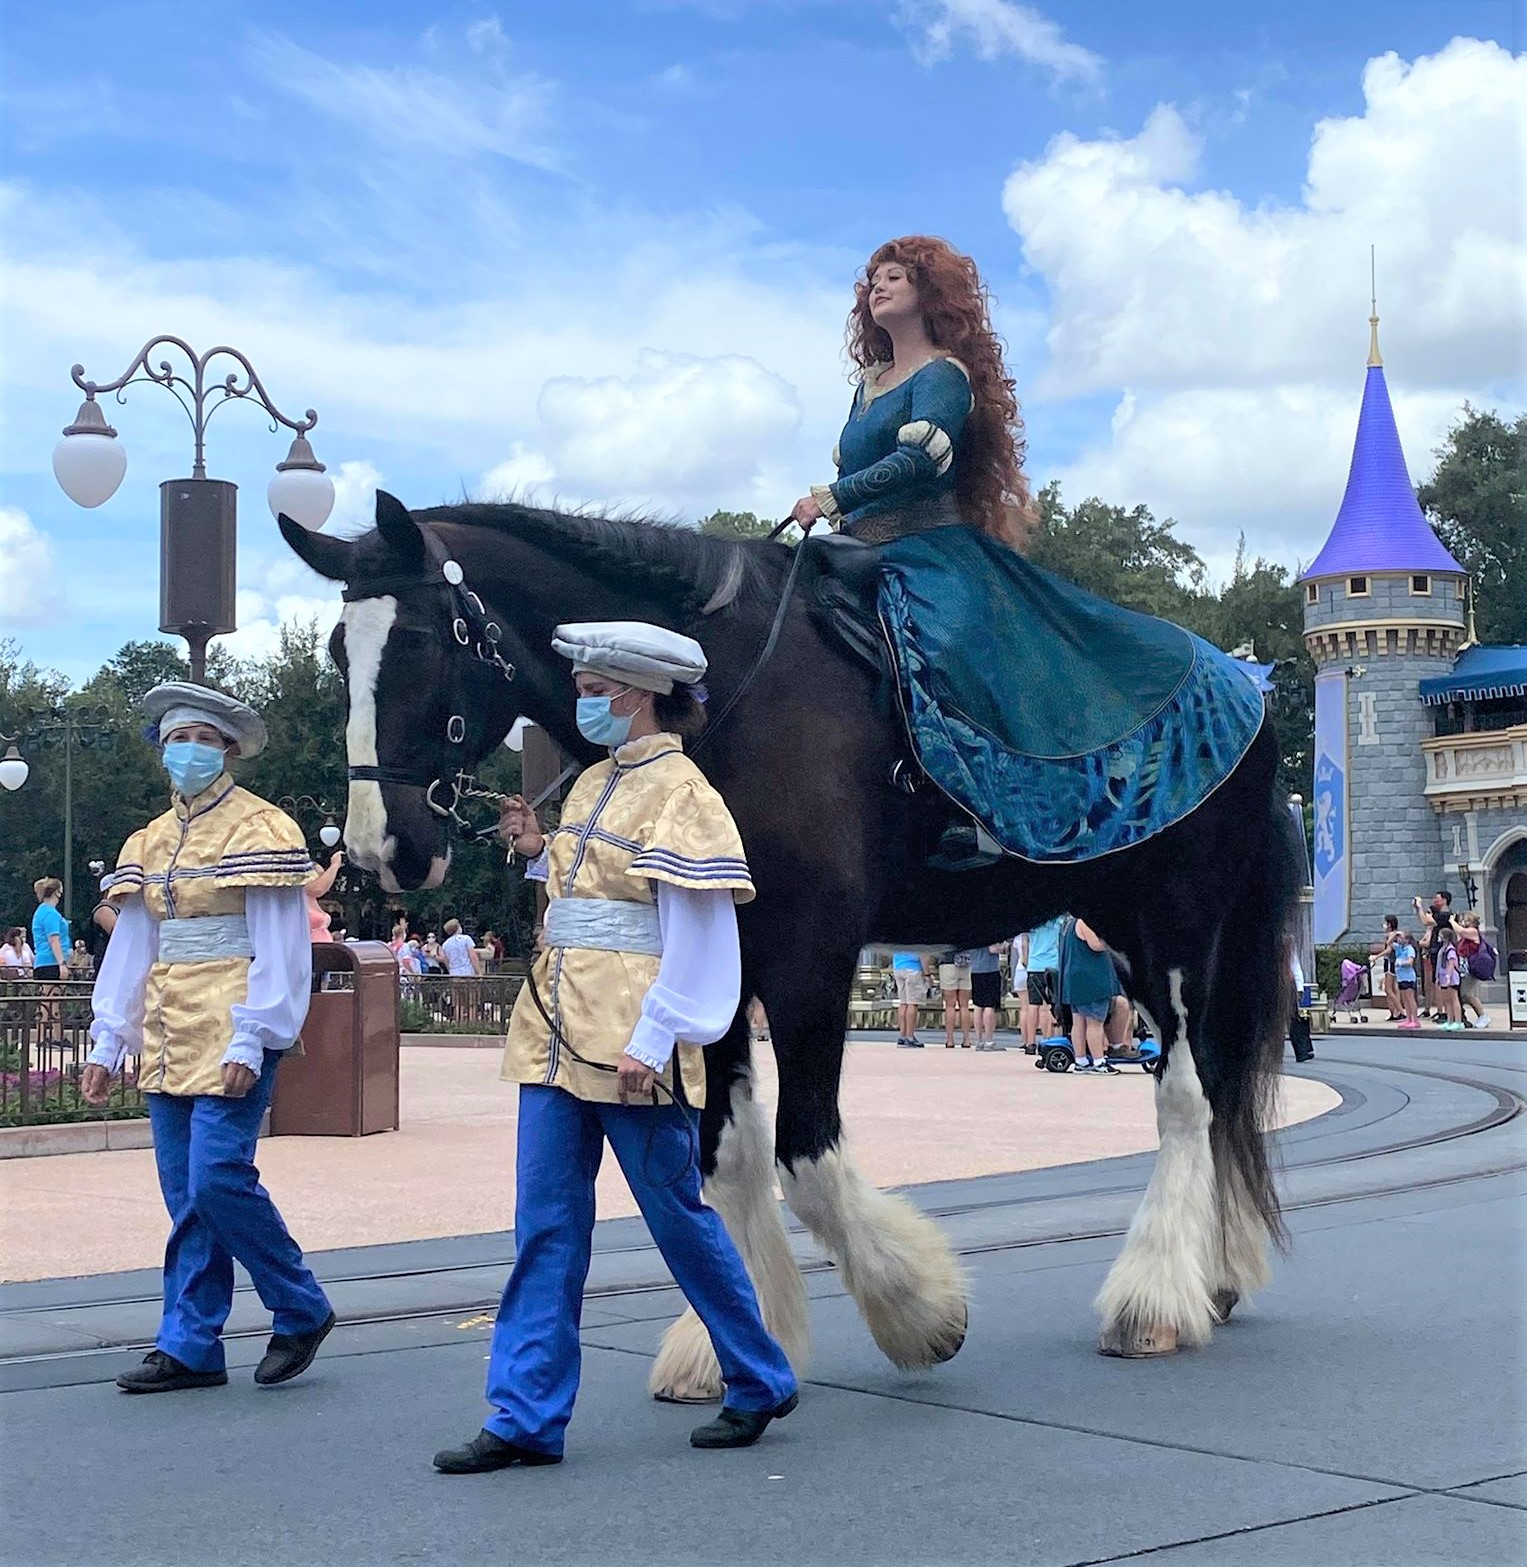 merida riding a horse in magic kingdom